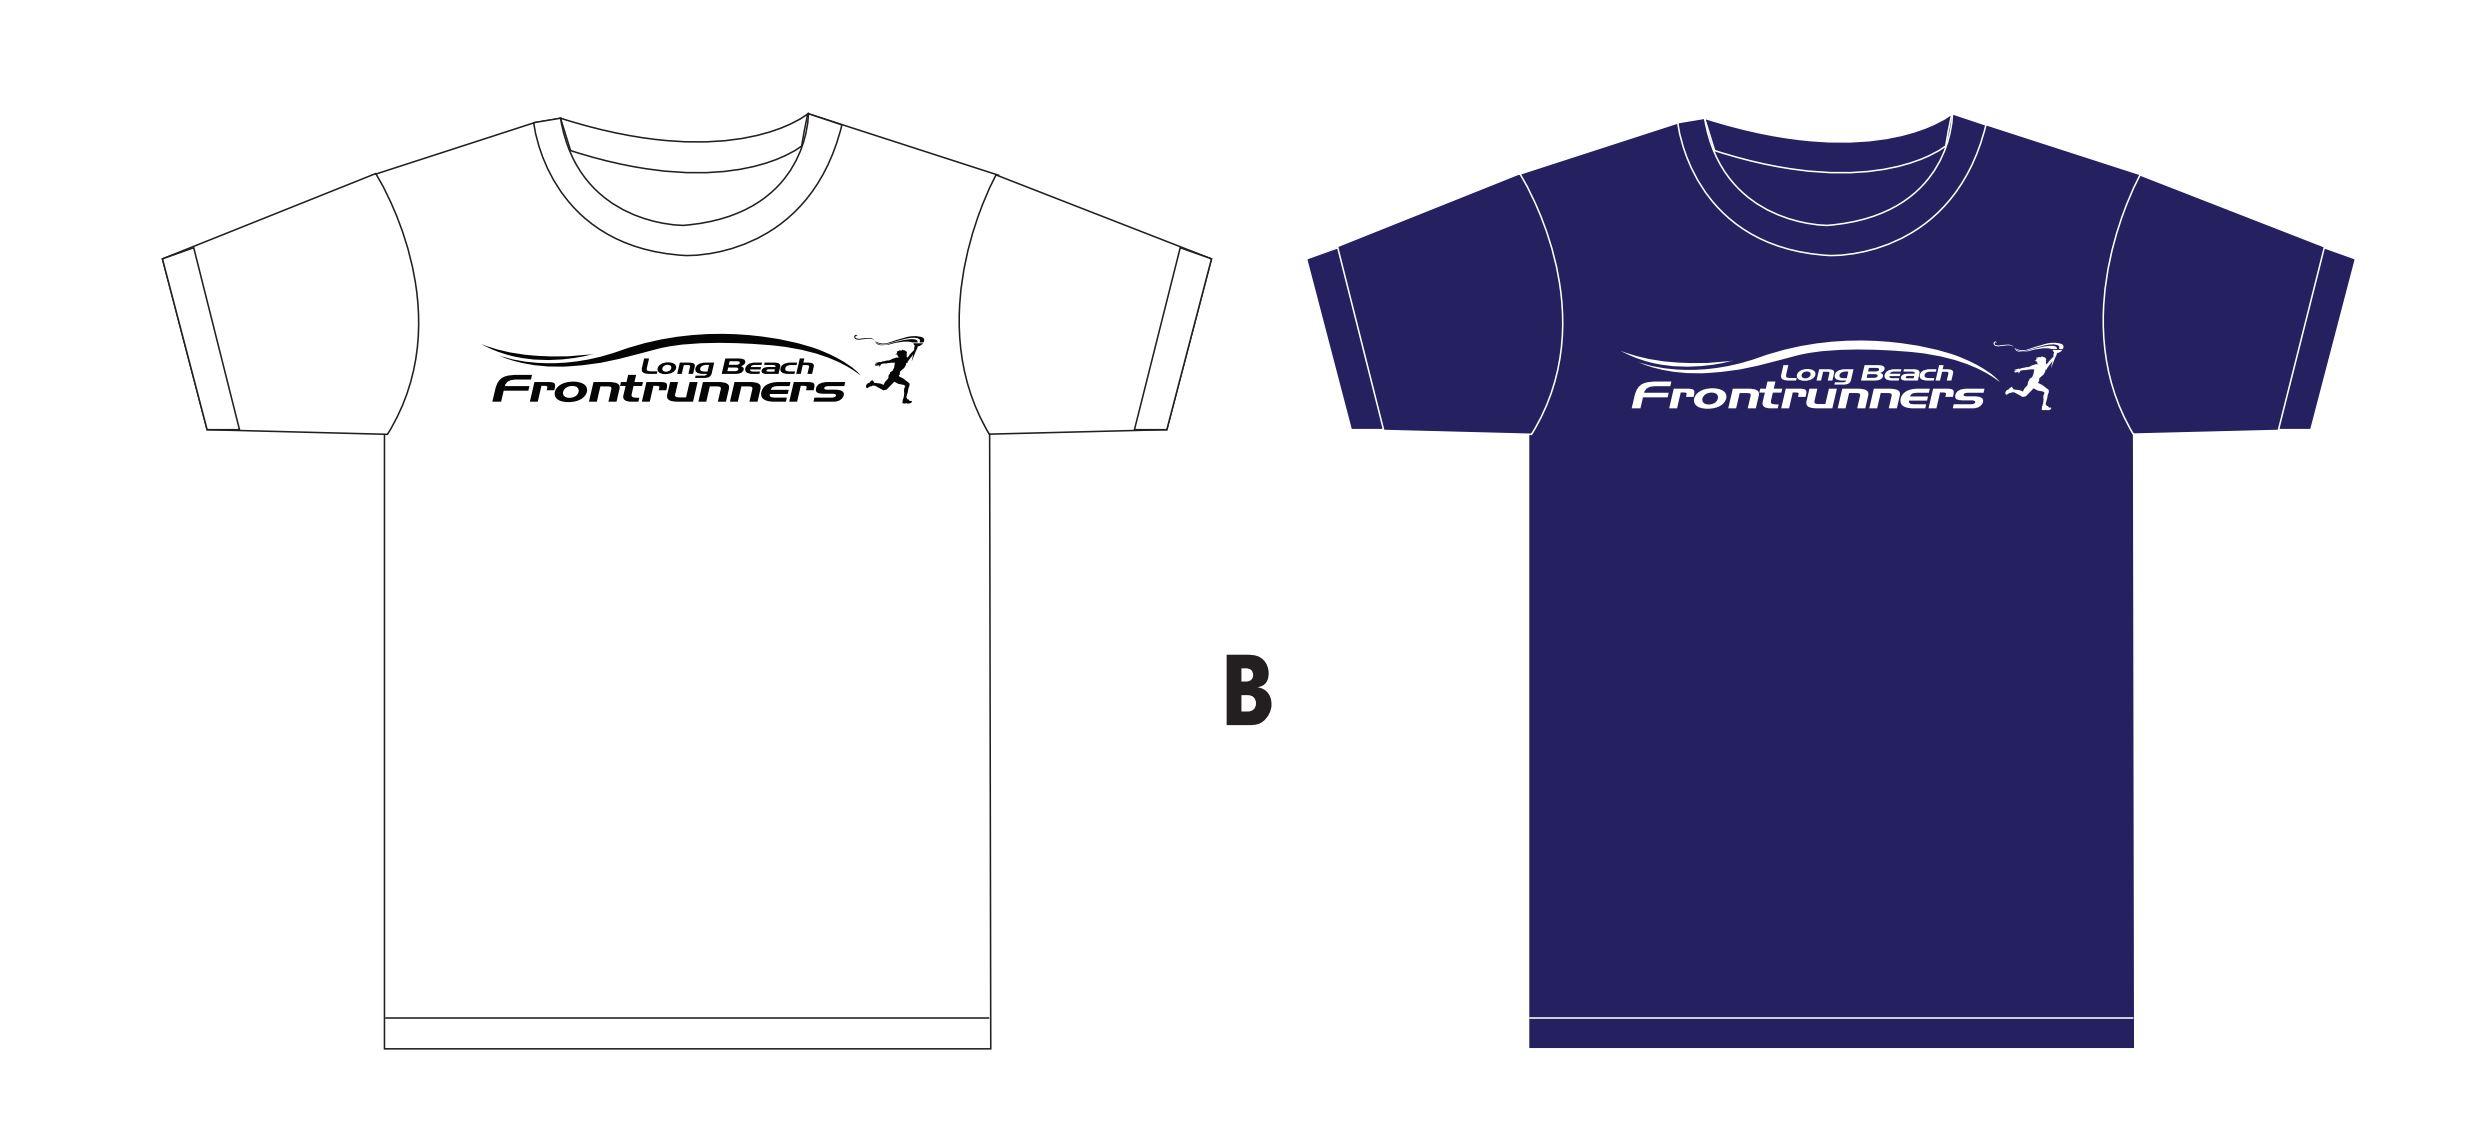 SFRLB running shirt options